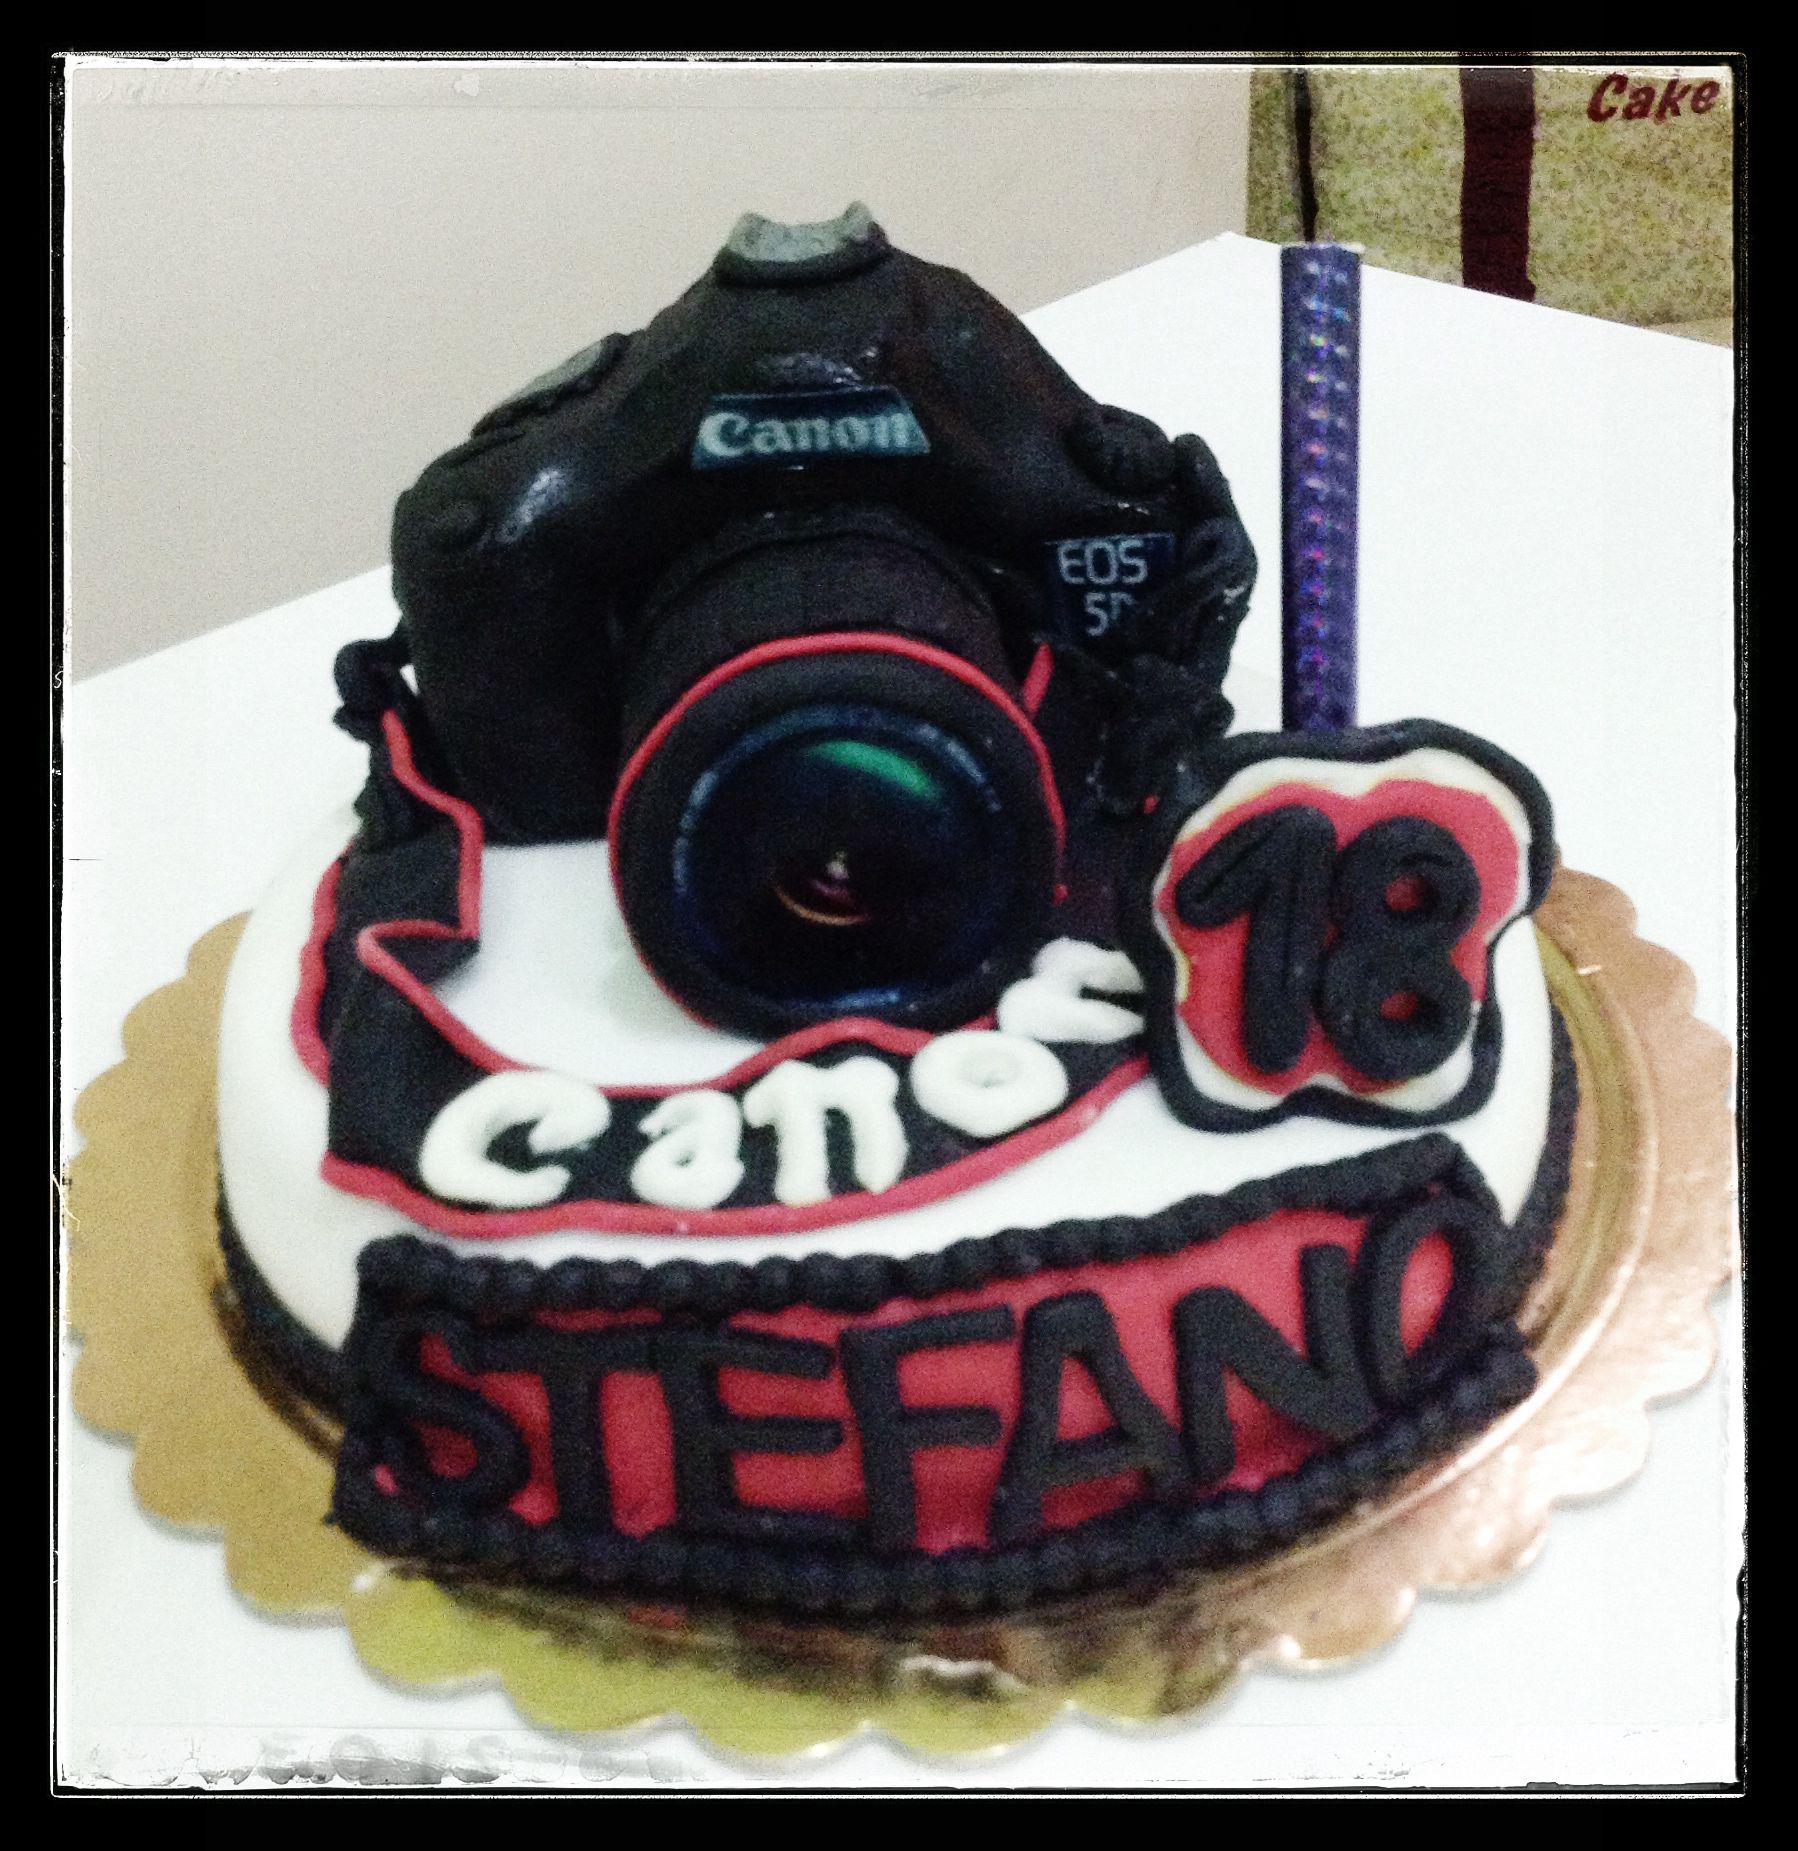 Canon cake ;)